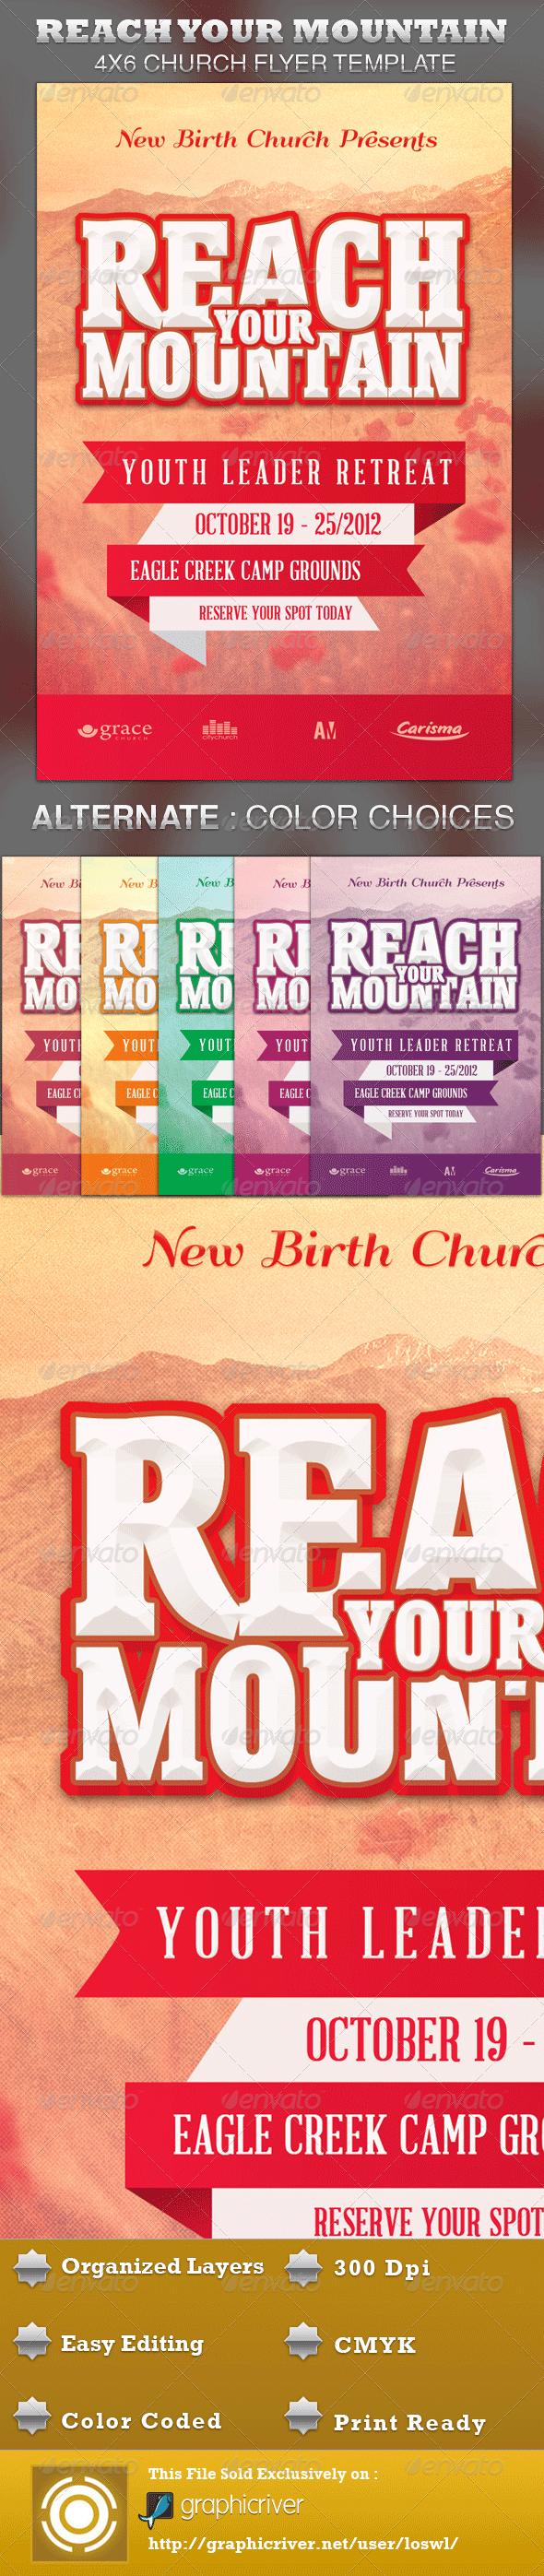 Reach Your Mountain Church Flyer Template - Church Flyers